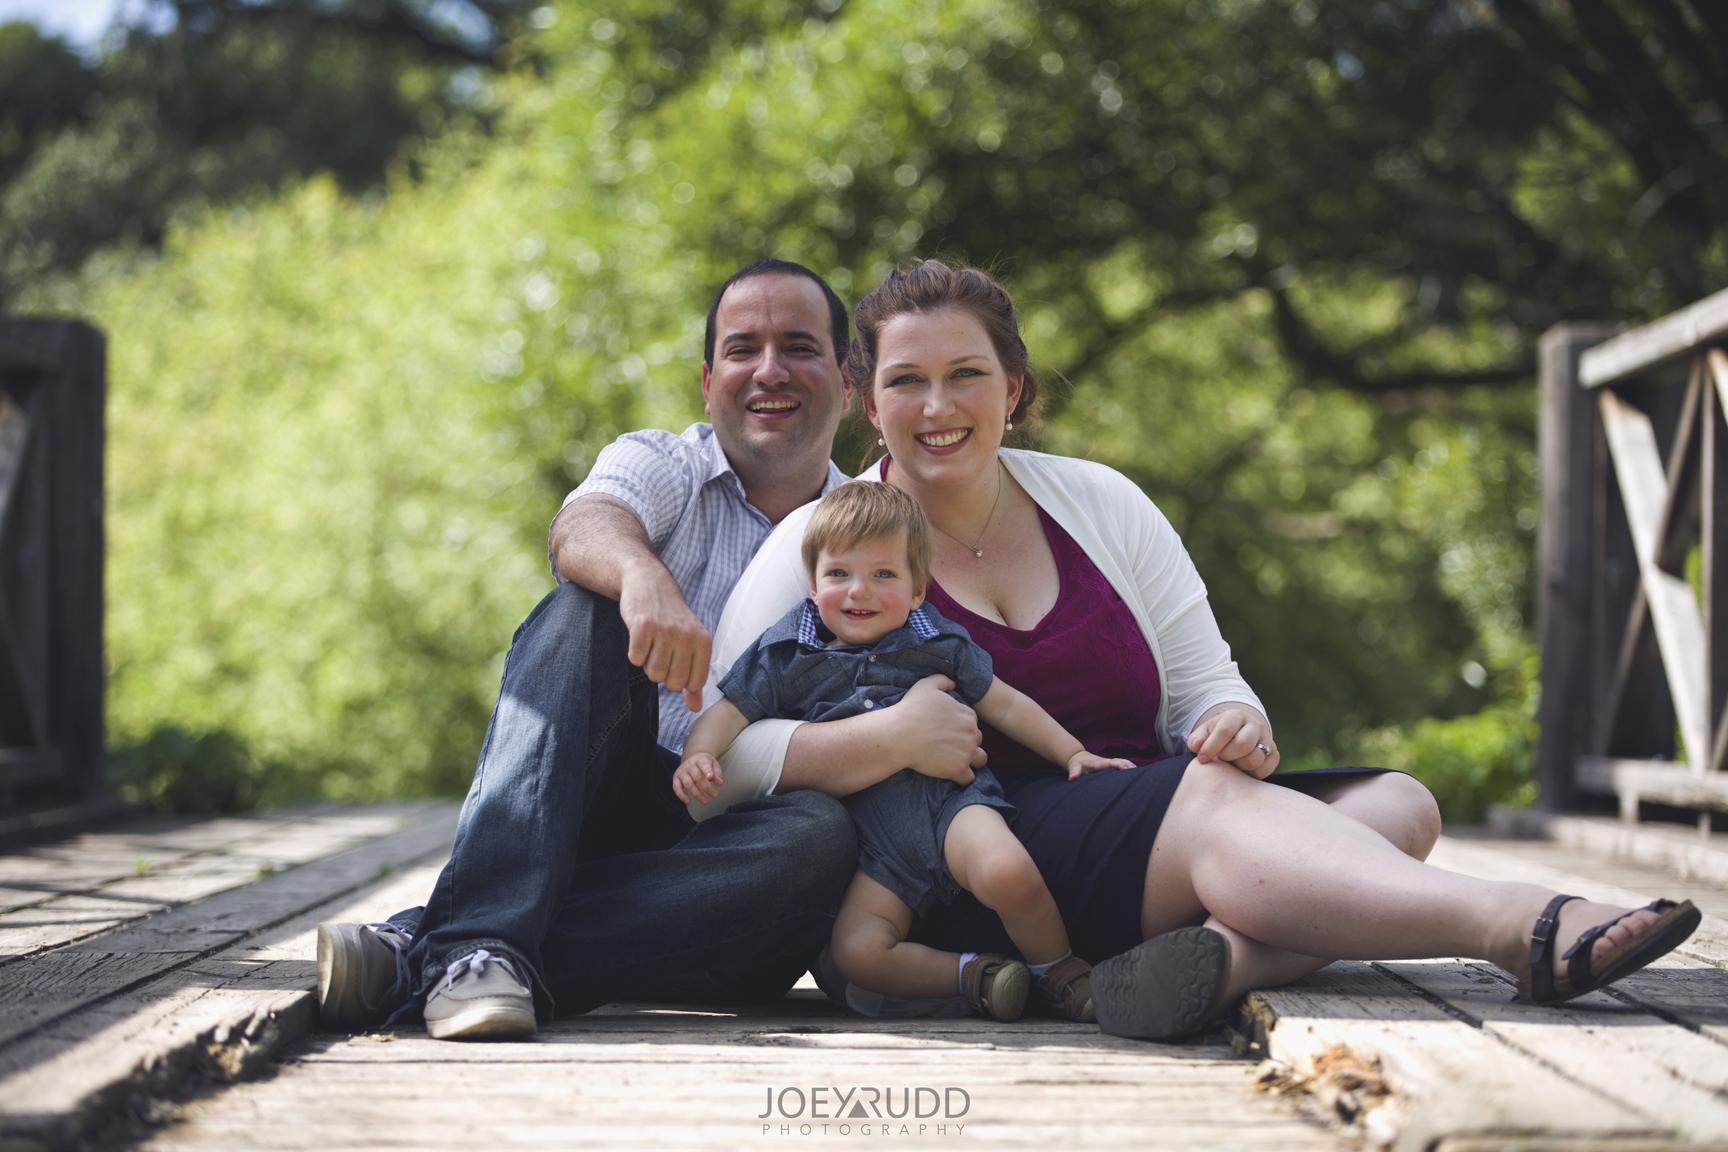 Ottawa Family Photographer Joey Rudd Photography Arboretum Family on Bridge in Ottawa